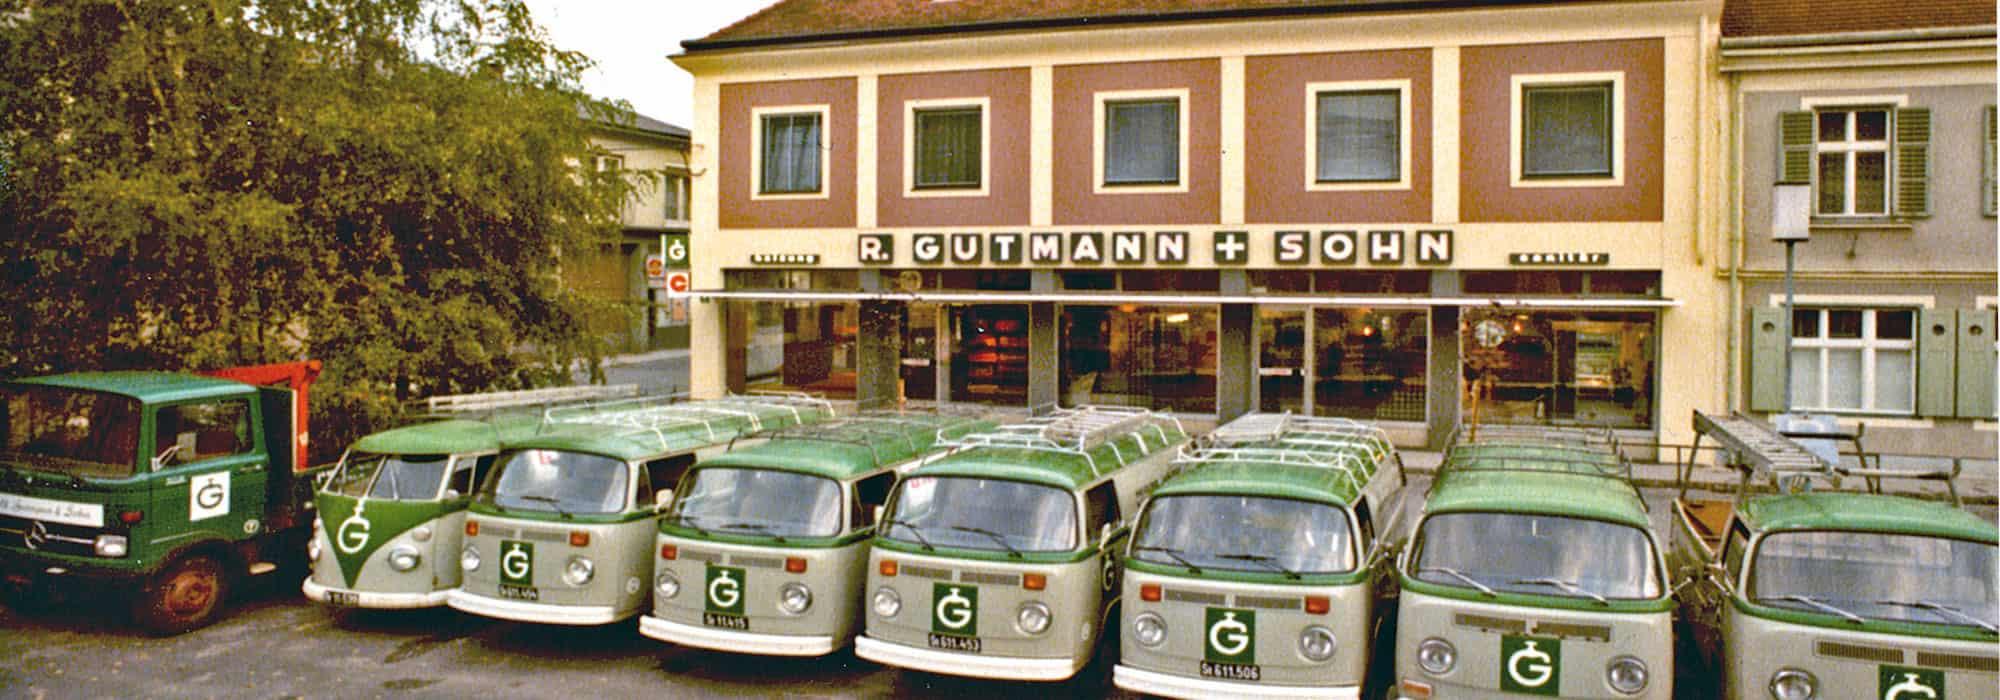 Gutmann Instatllationen 1976